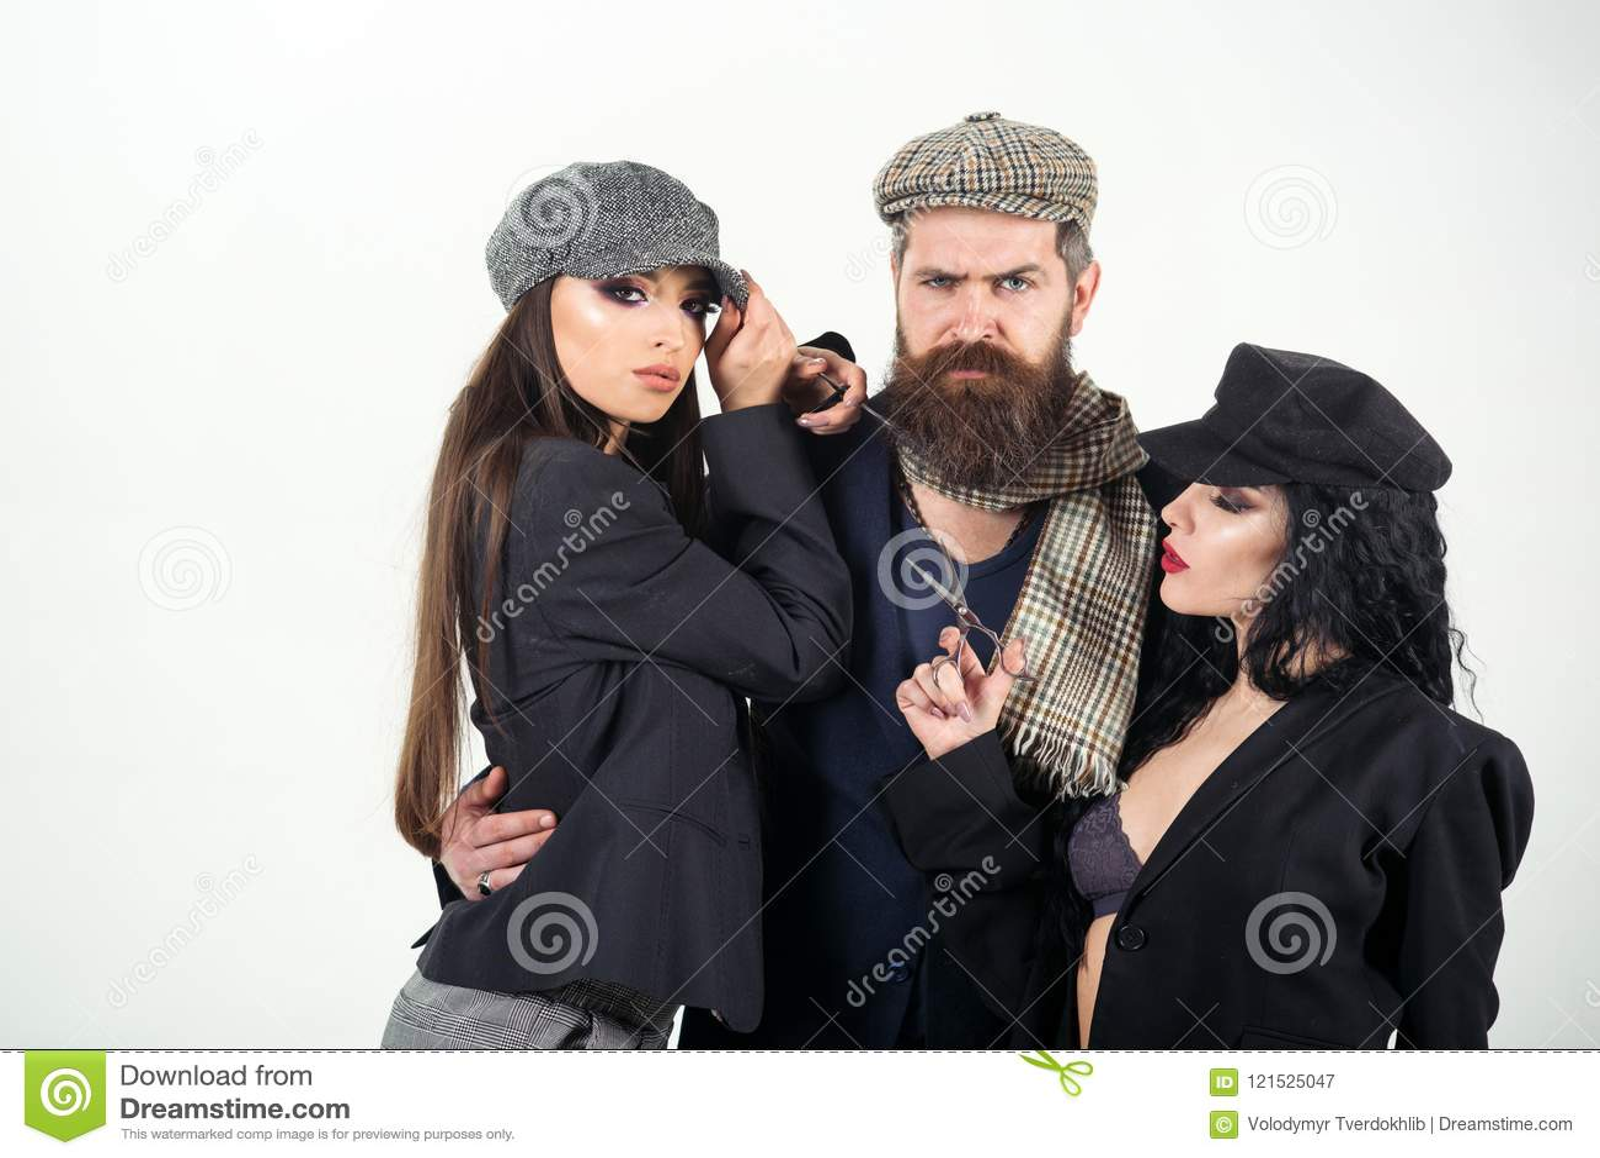 Salon concept. Bearded man hug women with barber tools, salon. Shaving or barber salon. Salon for real men. Create your